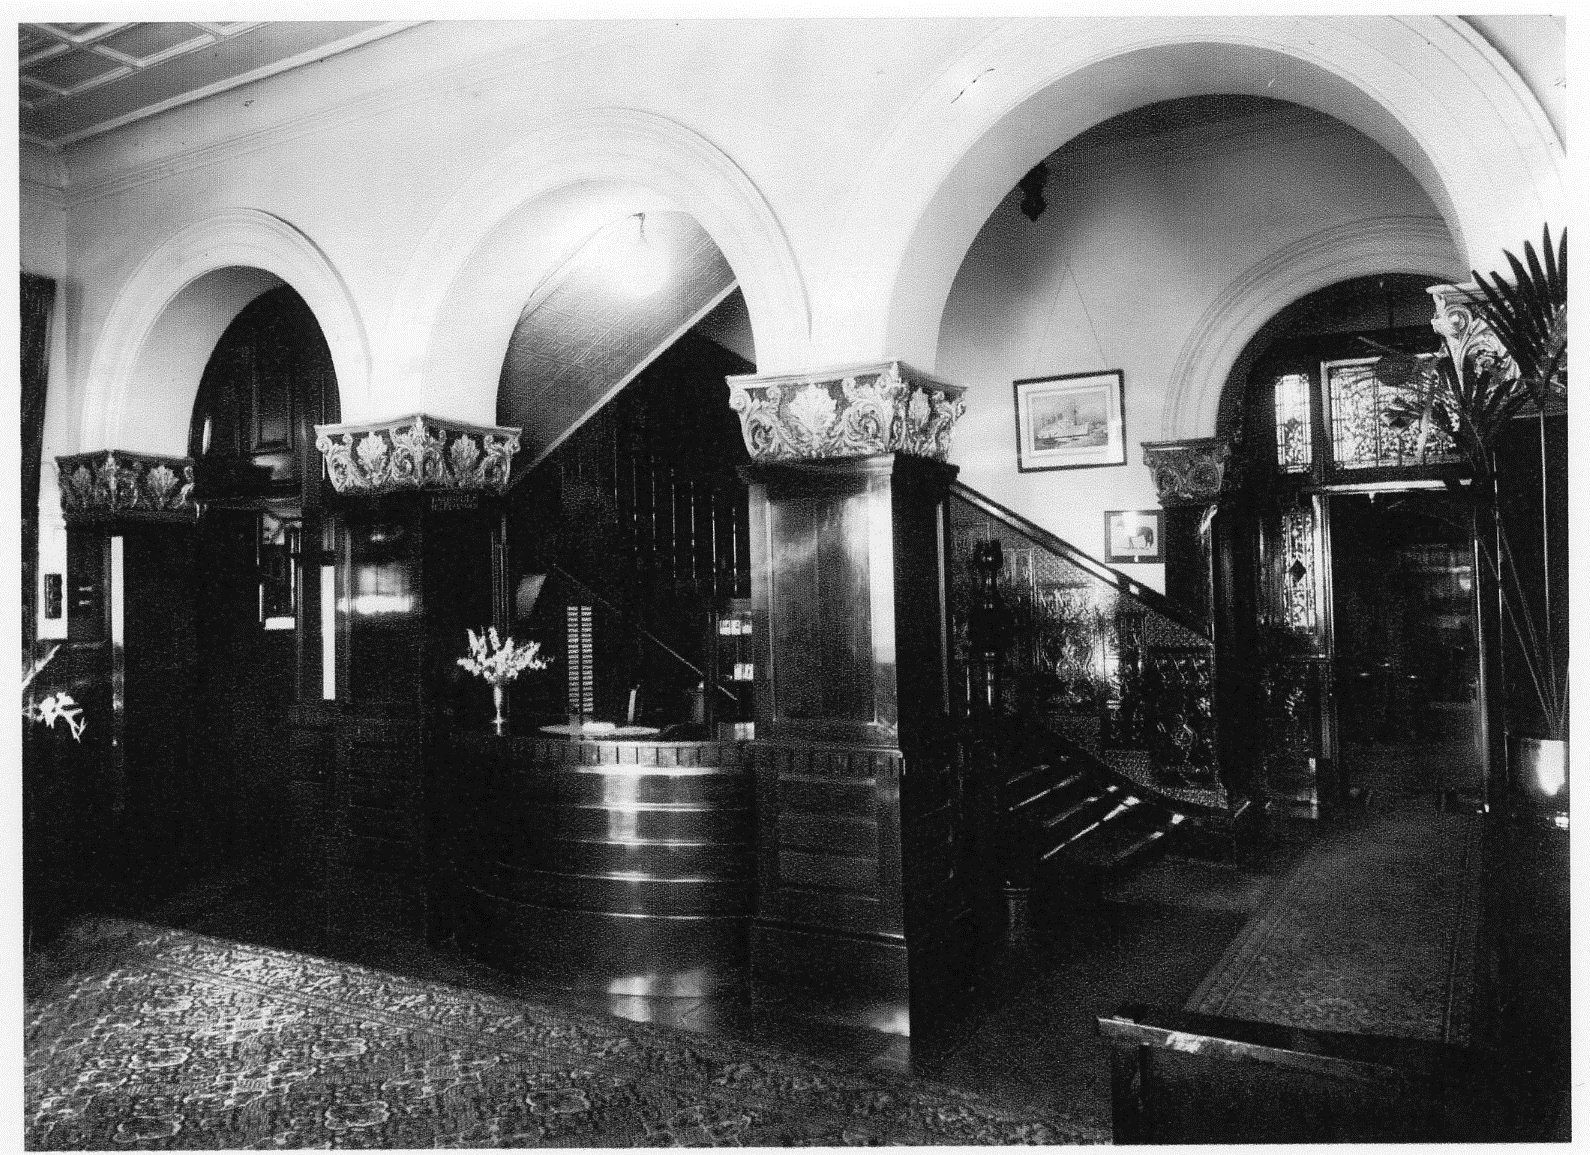 Western Foyer Box Office : Esplanade hotel entrance foyer and telephonist office